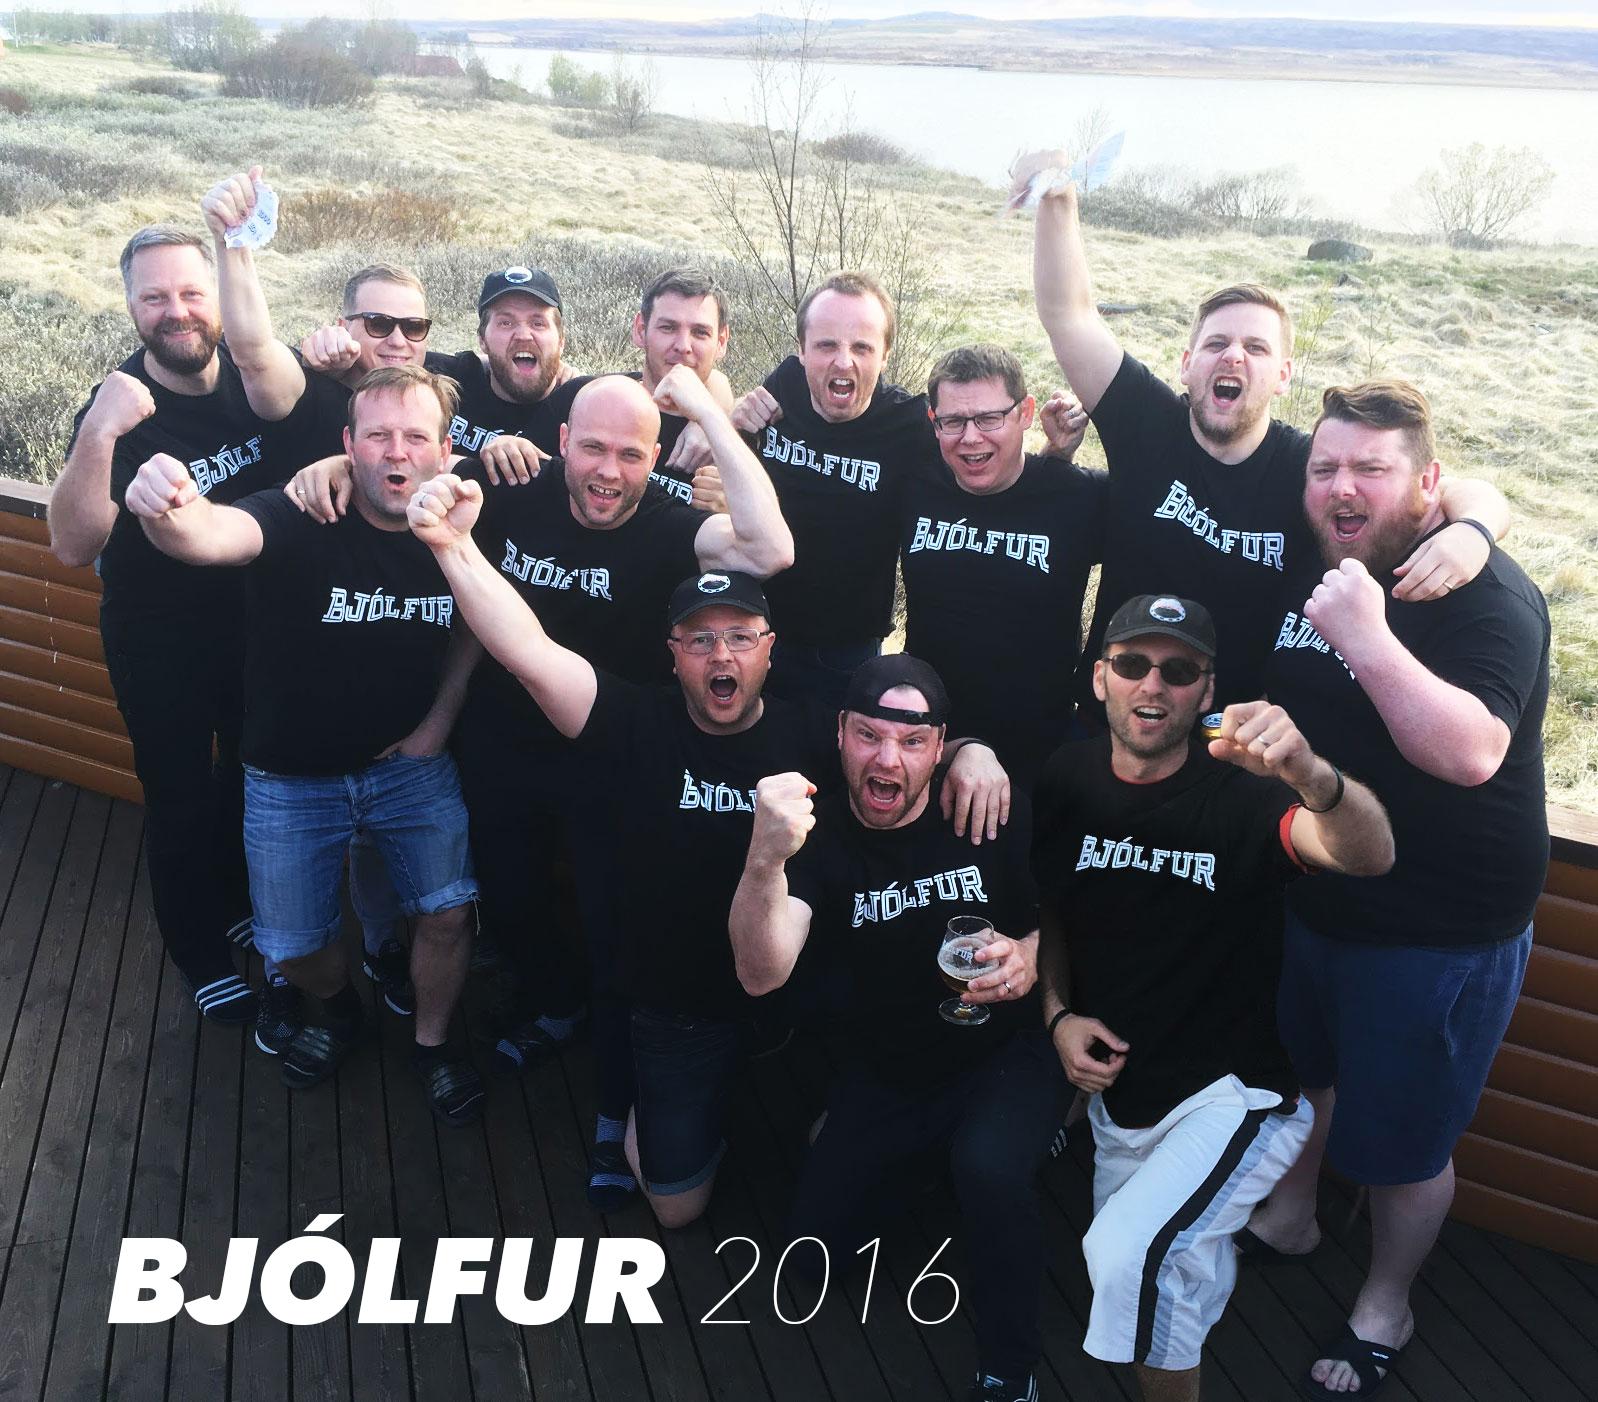 bjolfur_2016